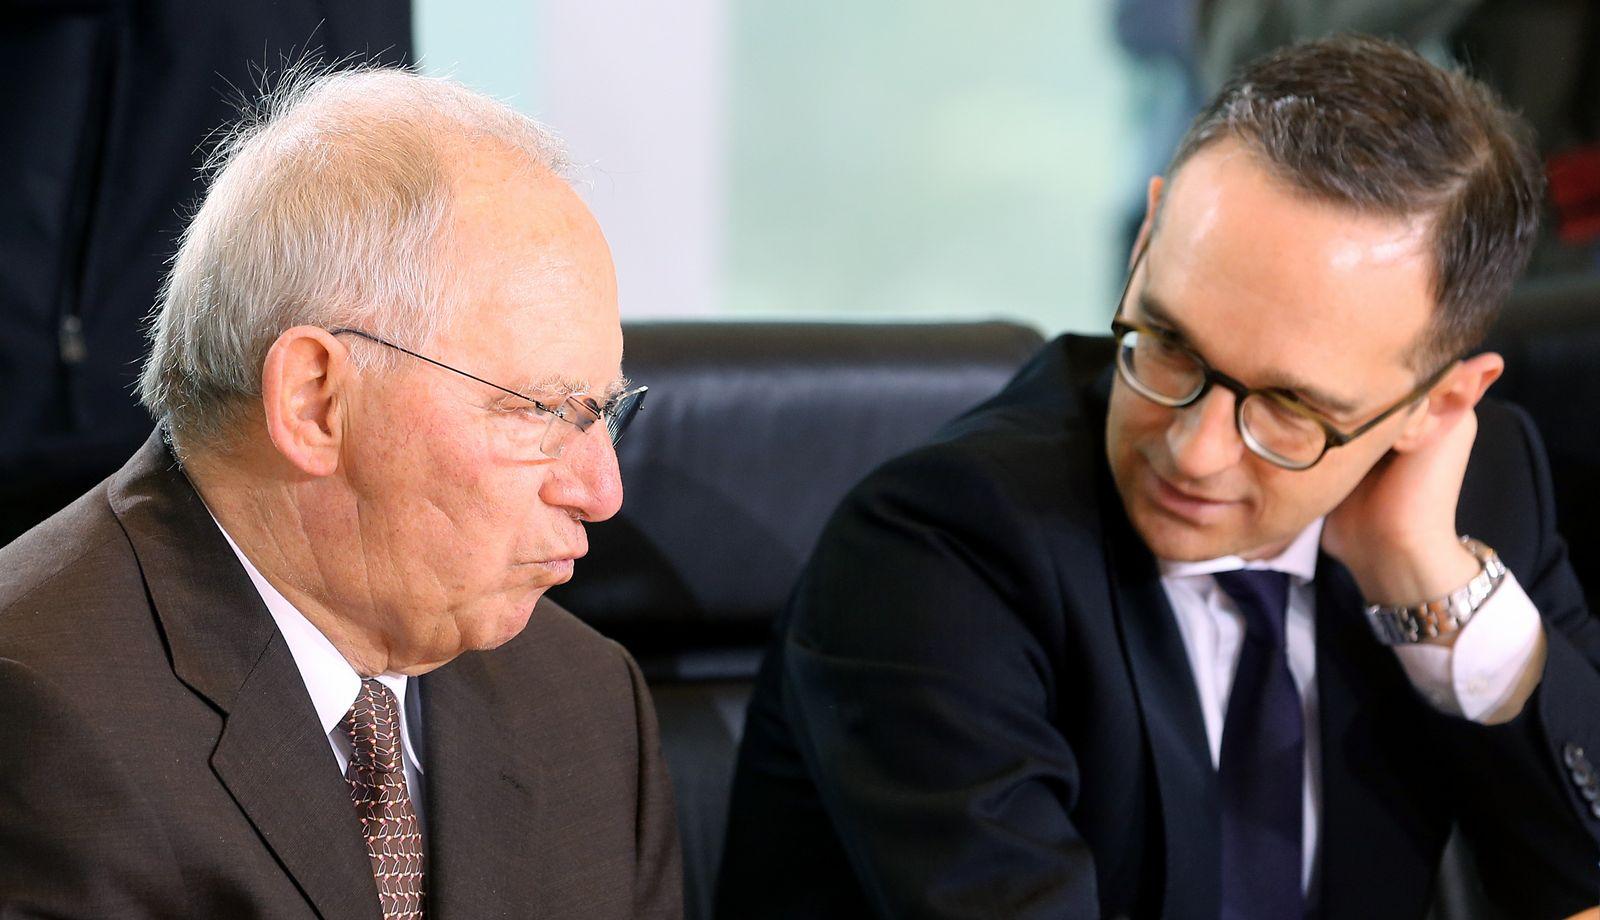 Wolfgang Schäuble / Heiko Maas